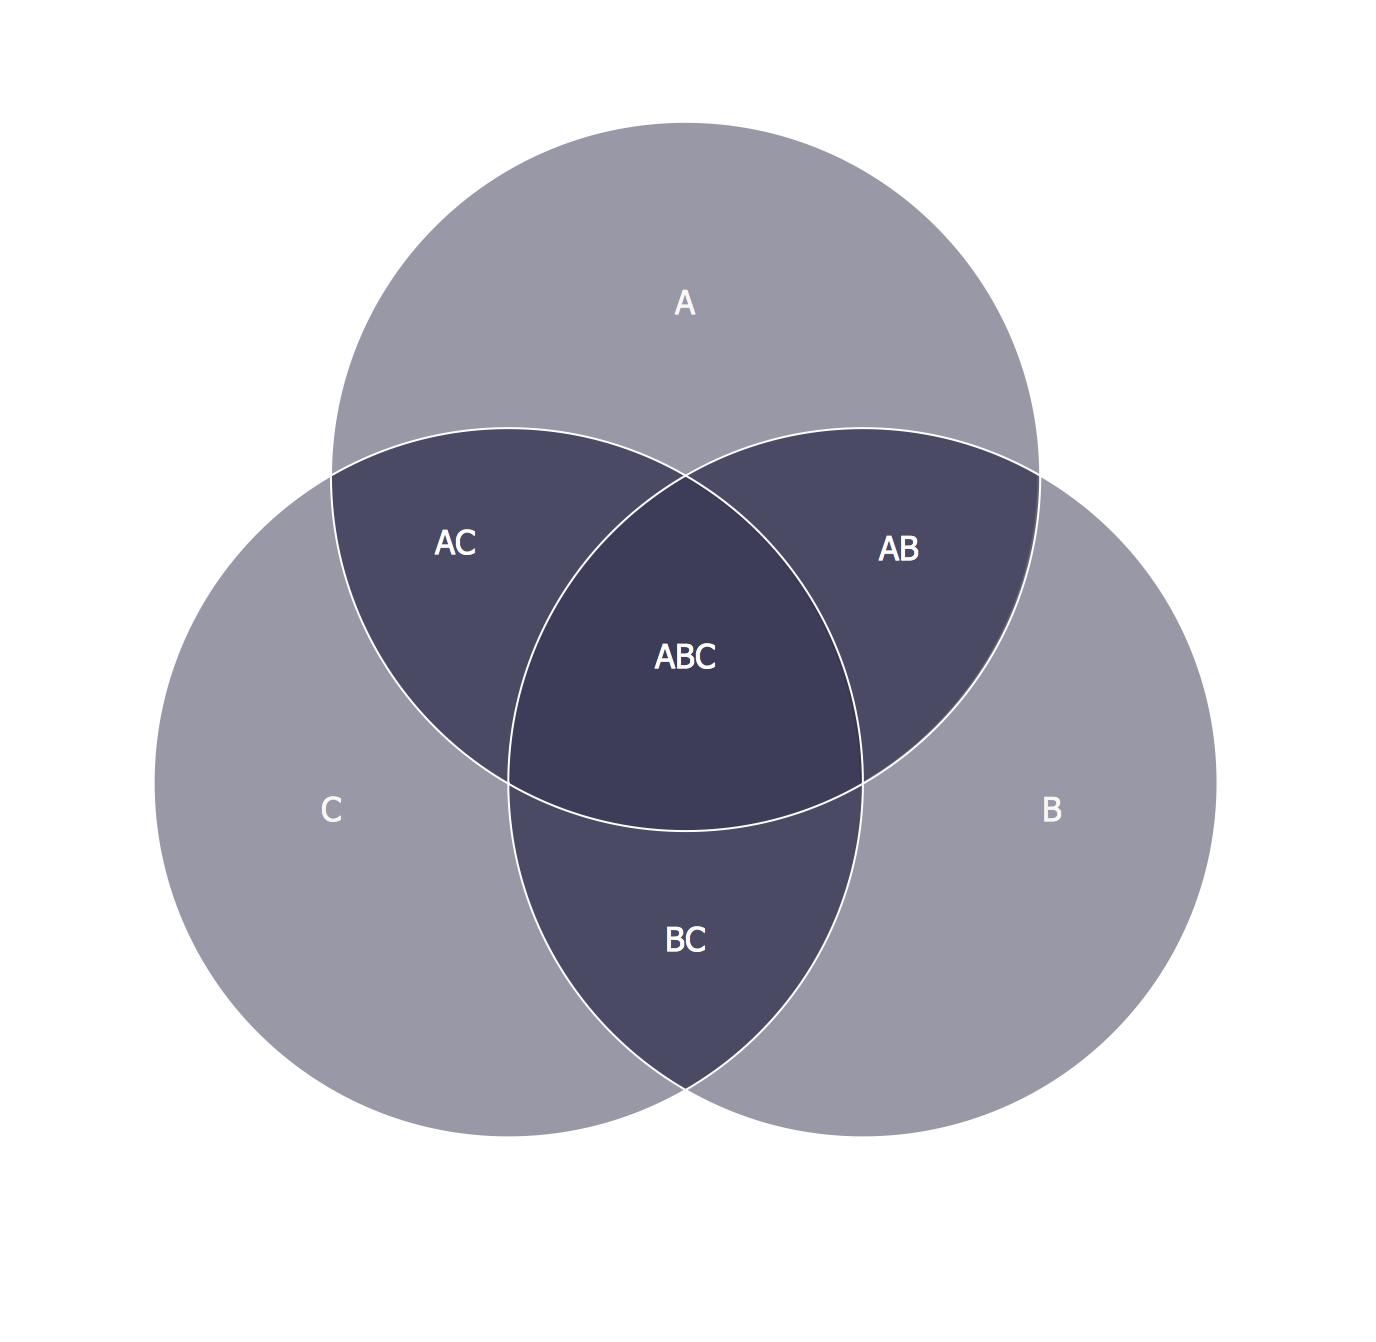 Venn Diagram Example. 3 Circle Venn